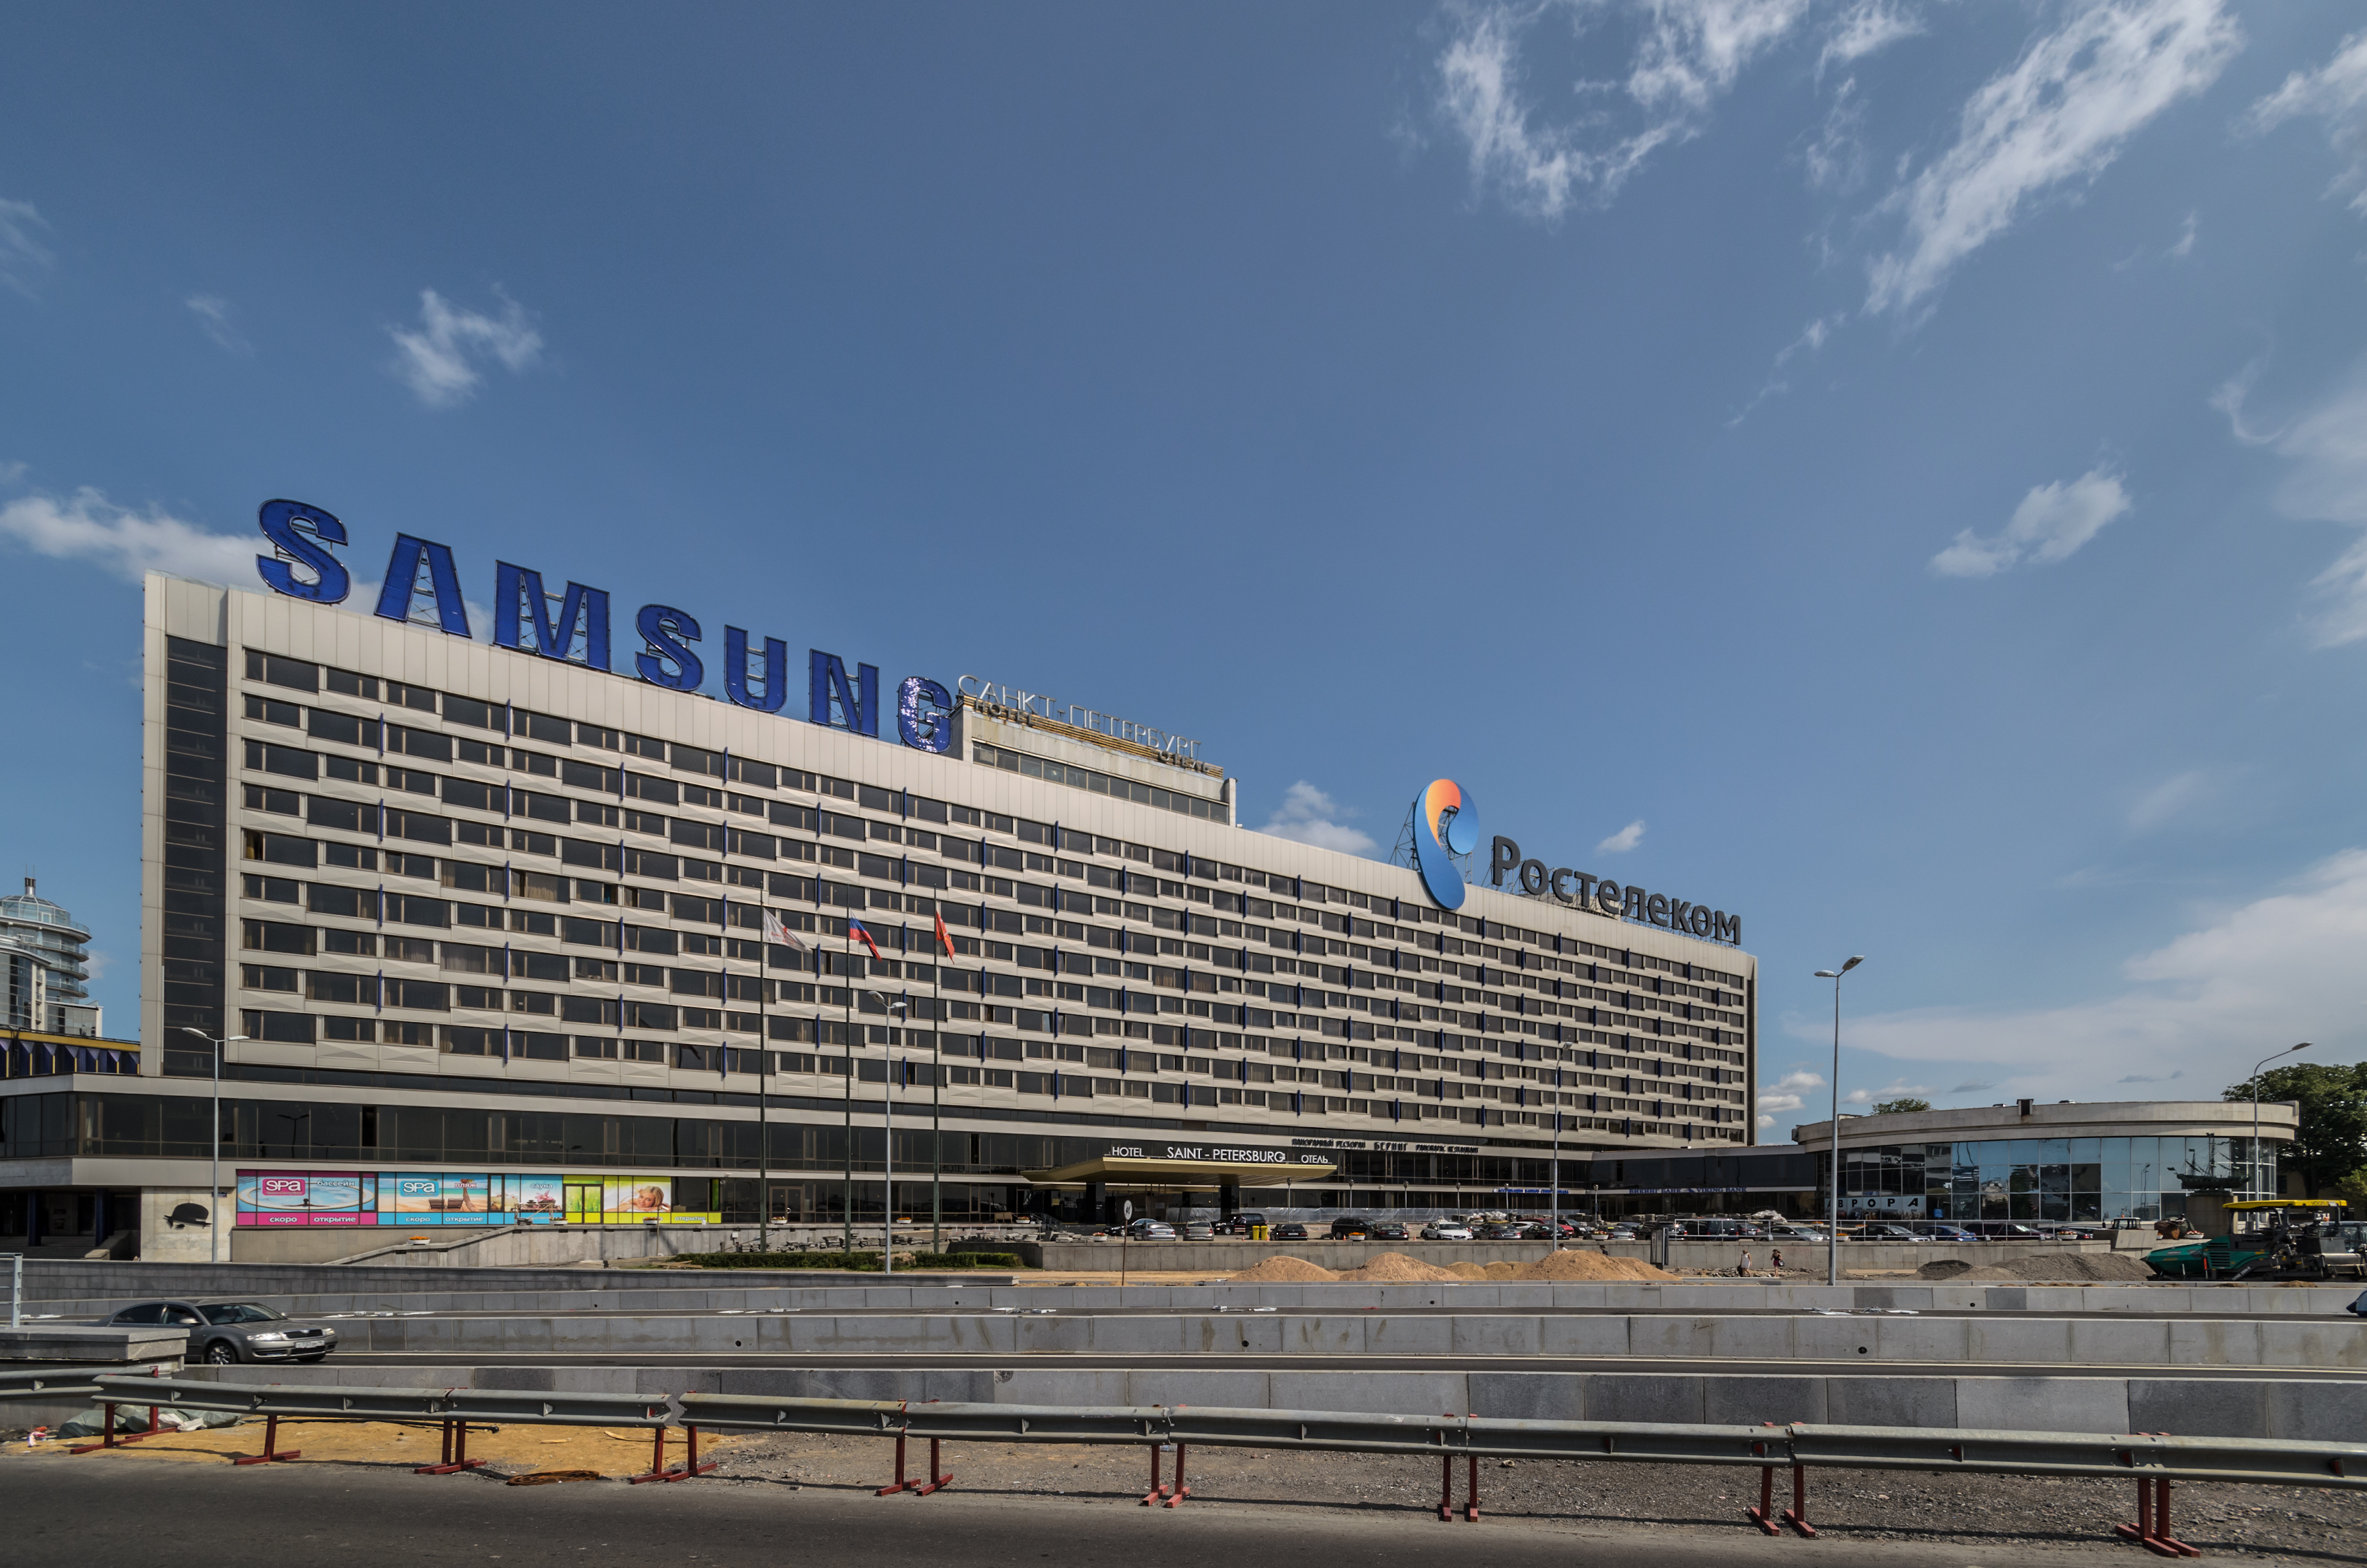 St Petersburg Hotels Downtown